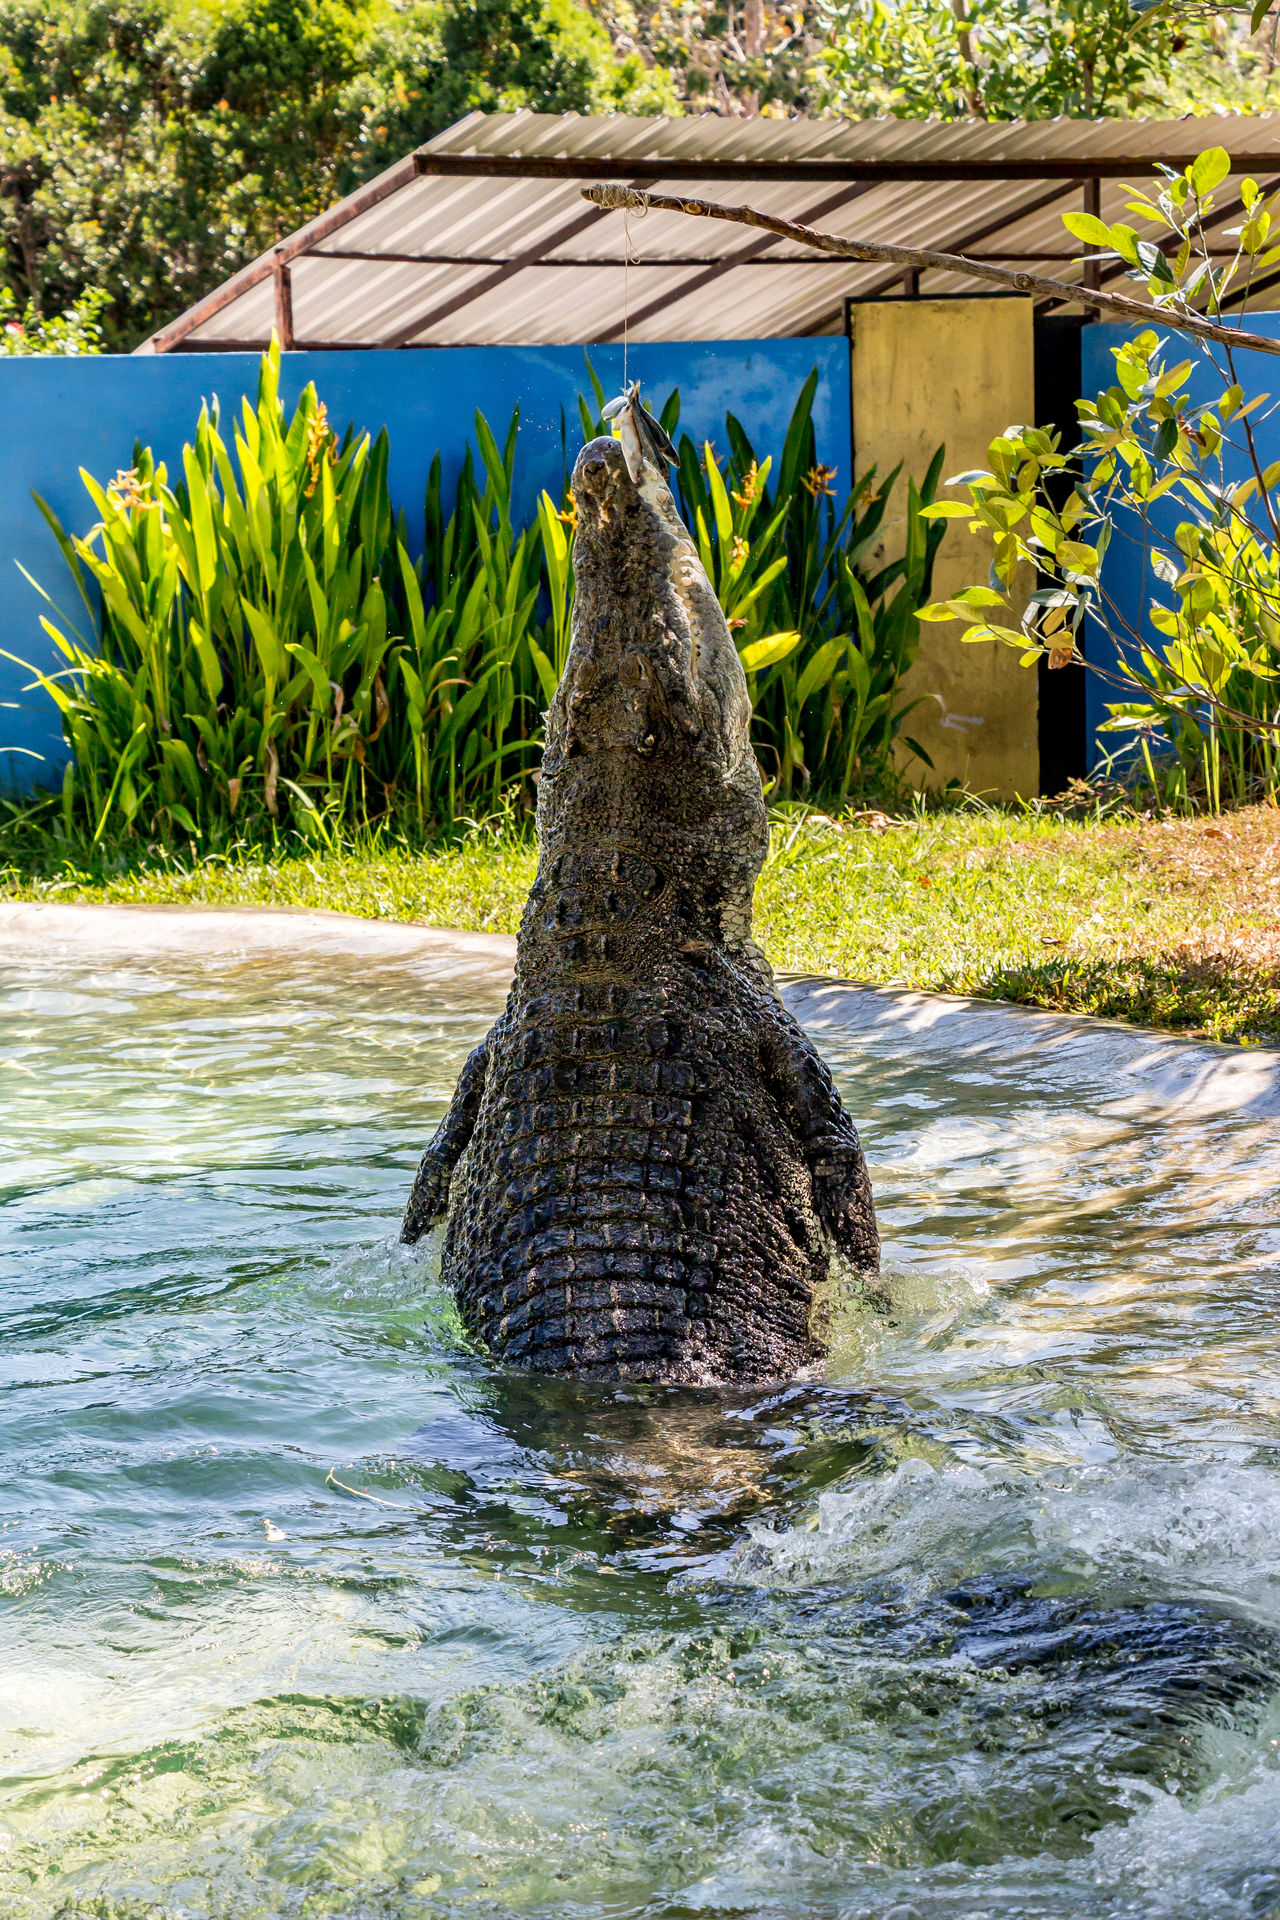 Beautiful stock photos of krokodil, water, shadow, outdoors, no people